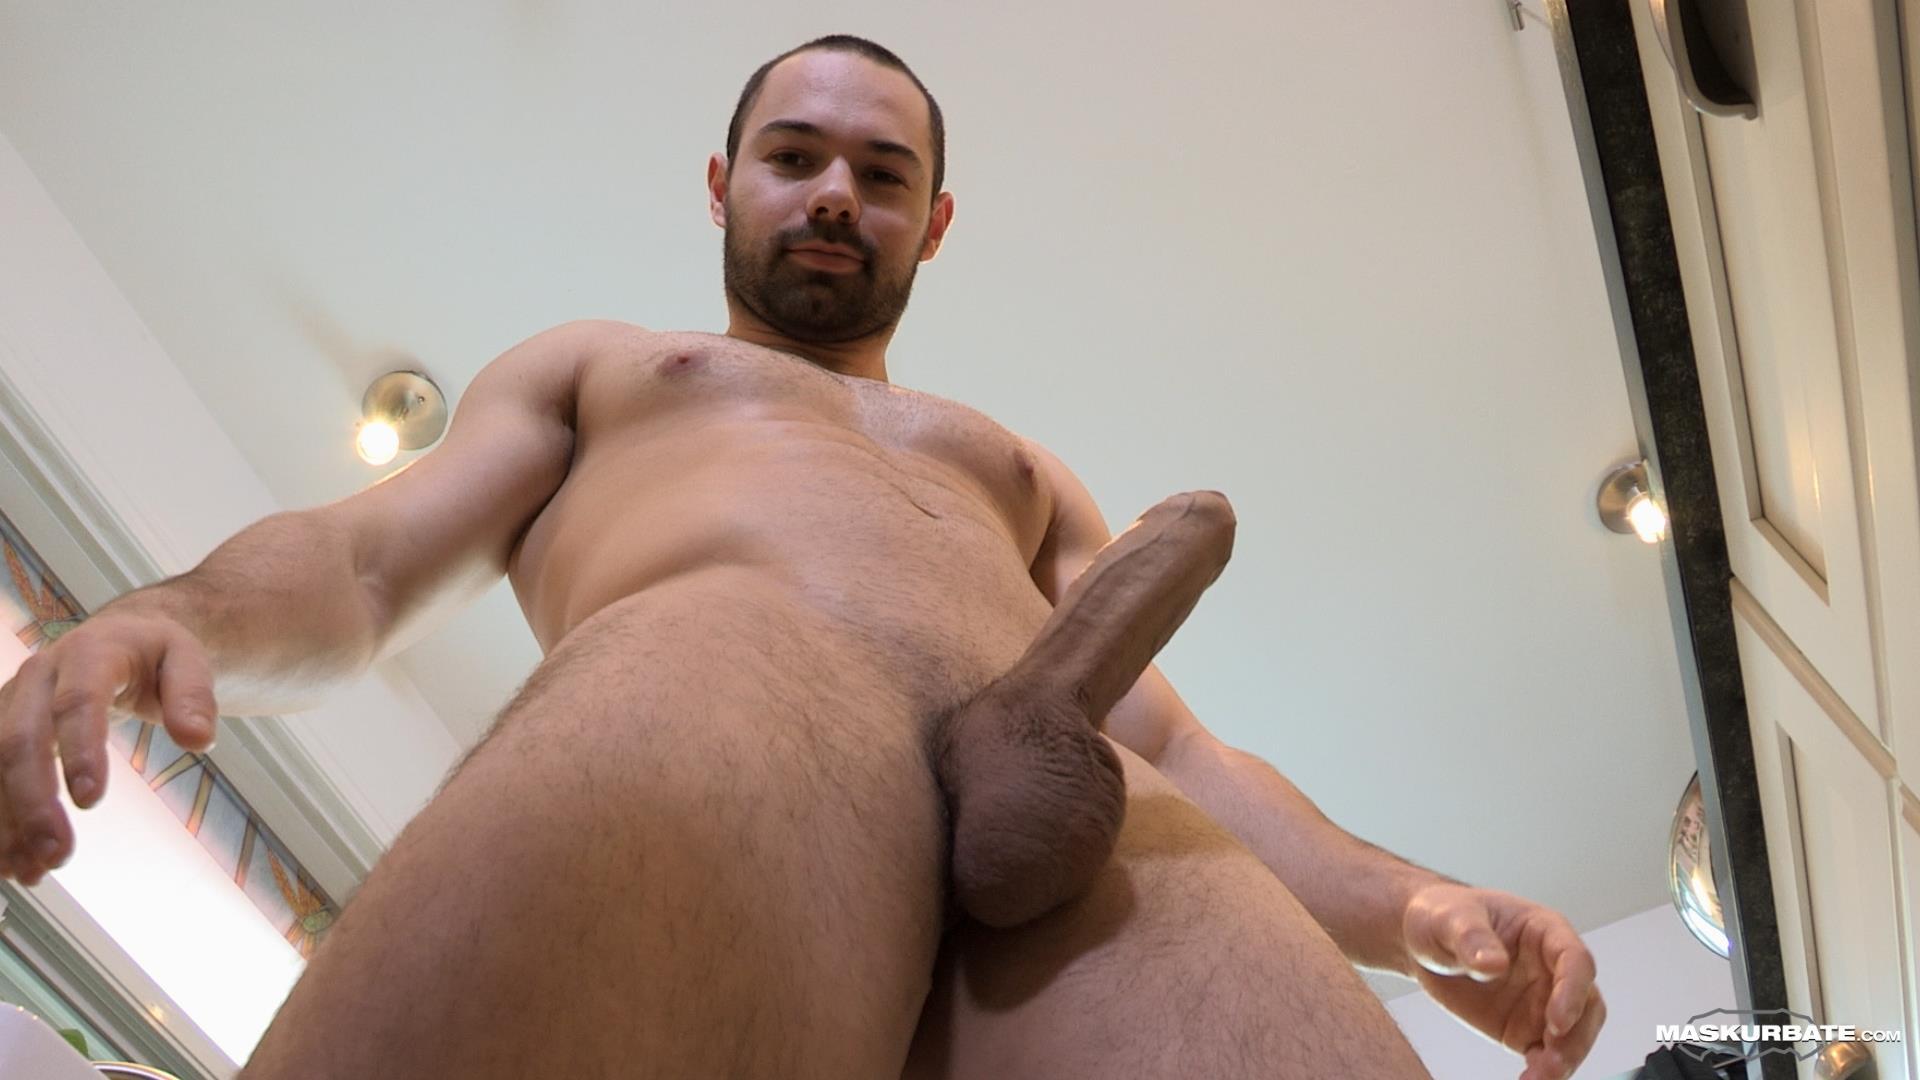 Kankan showgirl porn pic